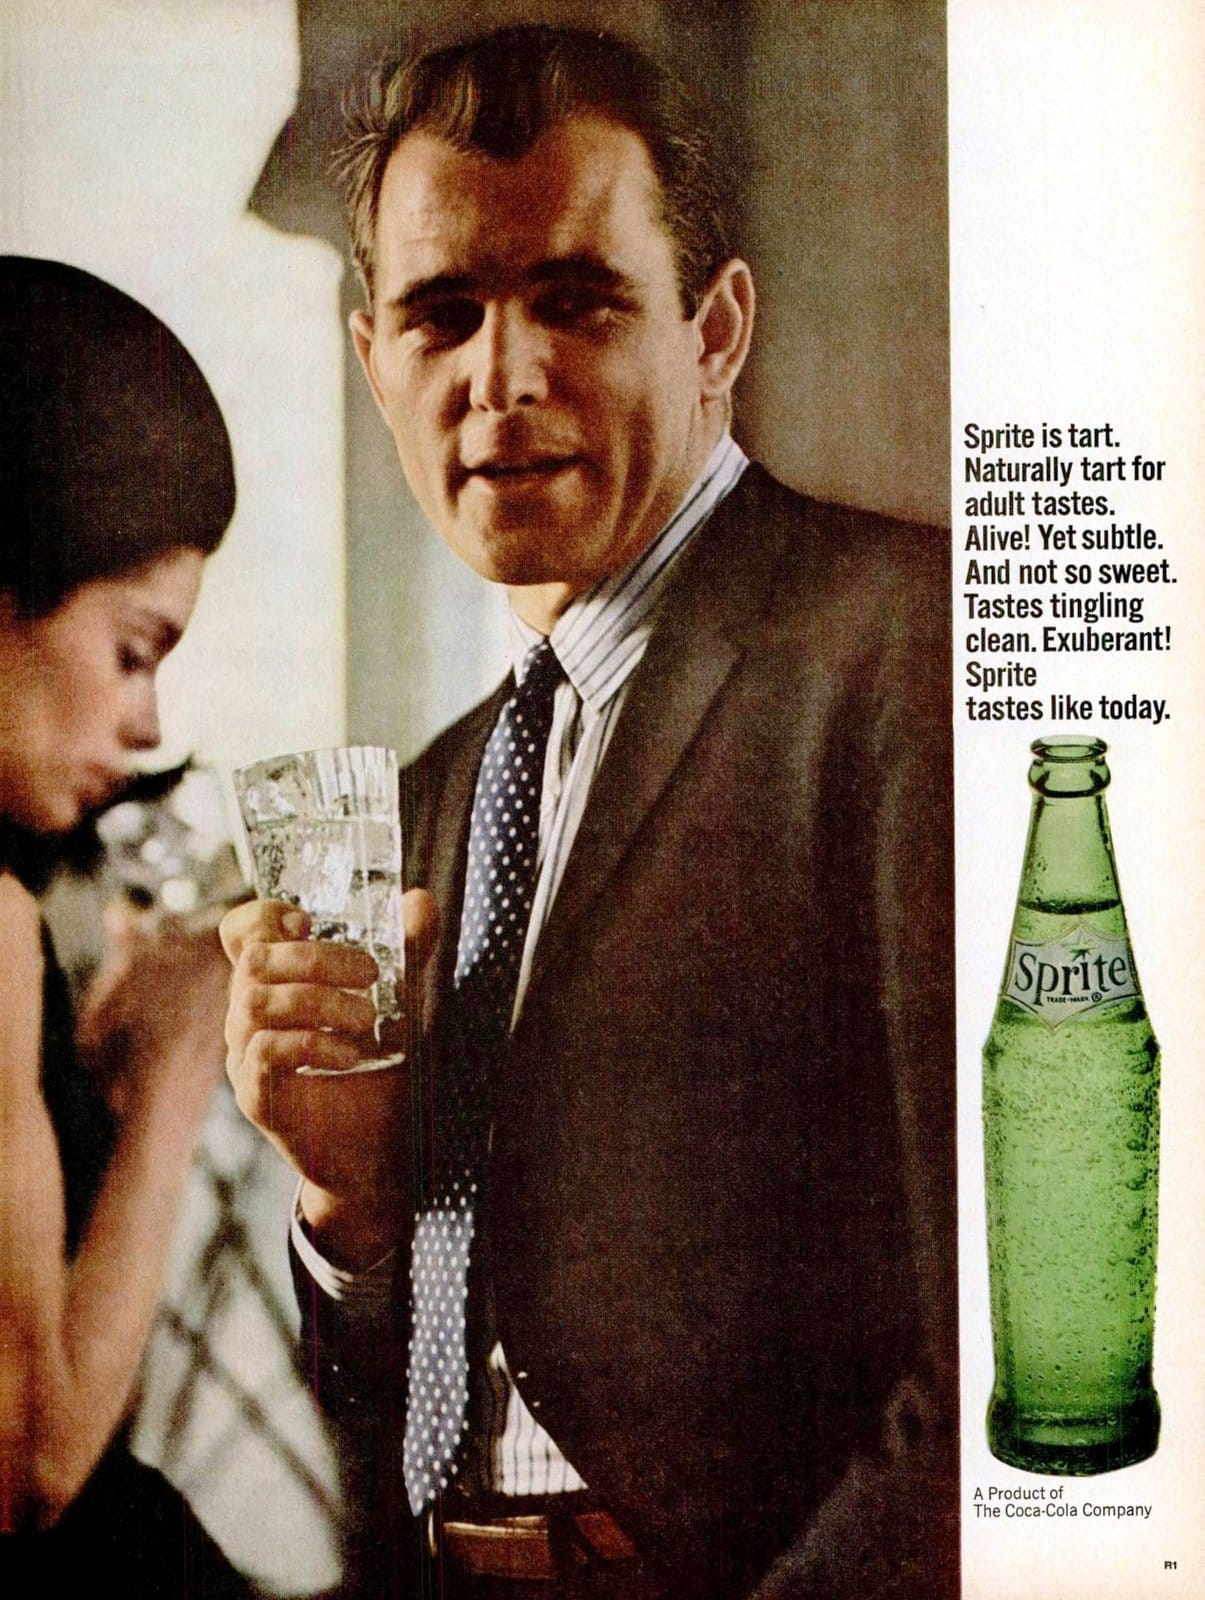 Sprite tastes like today (1964)